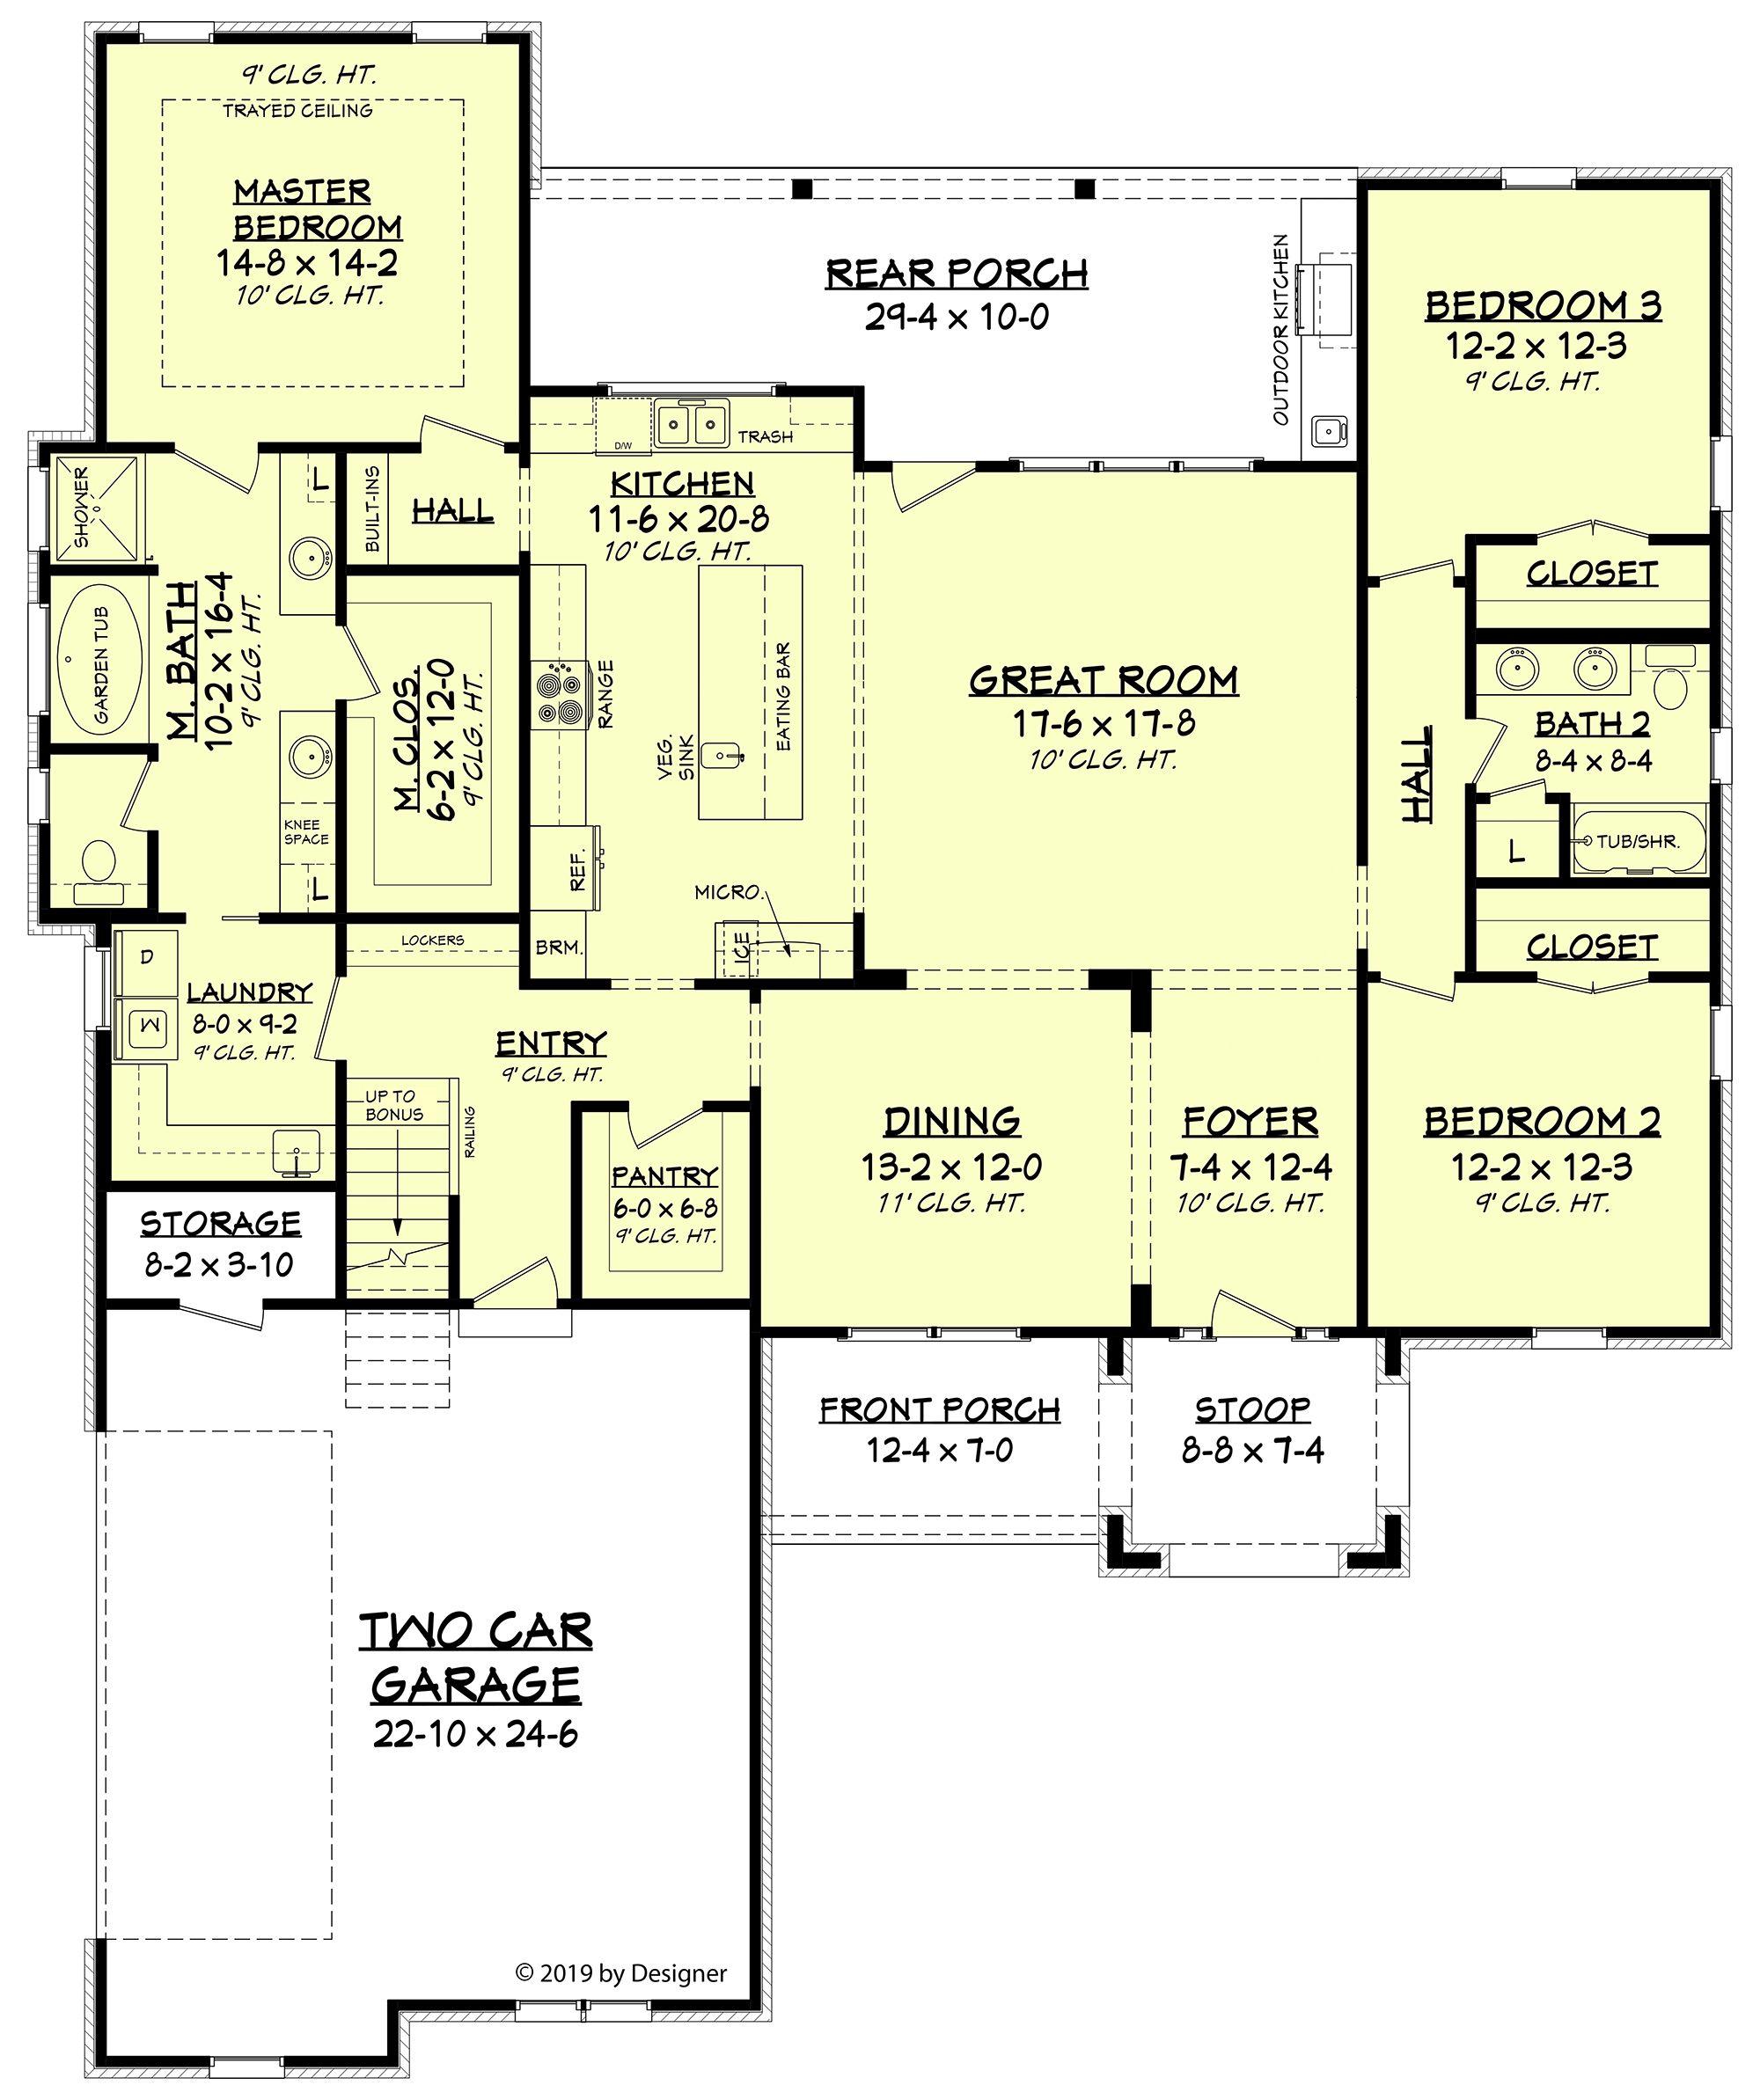 House Plan 041 00192 Modern Farmhouse Plan 2 165 Square Feet 3 4 Bedrooms 2 Bathrooms Farmhouse Style House Plans Modern Farmhouse Plans American Houses